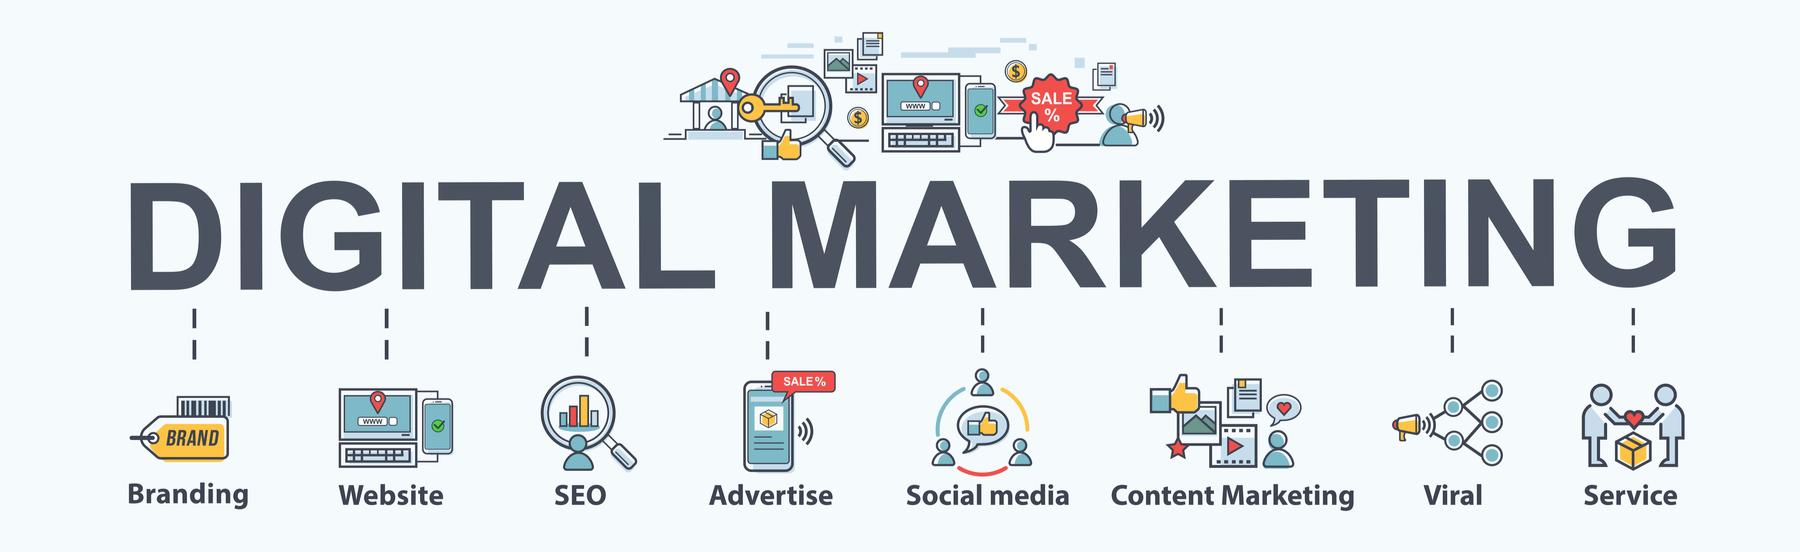 Aanha Services, Online Marketing Services, Best Digital marketing services, Aanha Services Digital Marketing Company in Delhi, best digital marketing services in delhi, digital marketing agency, affordable digital marketing services